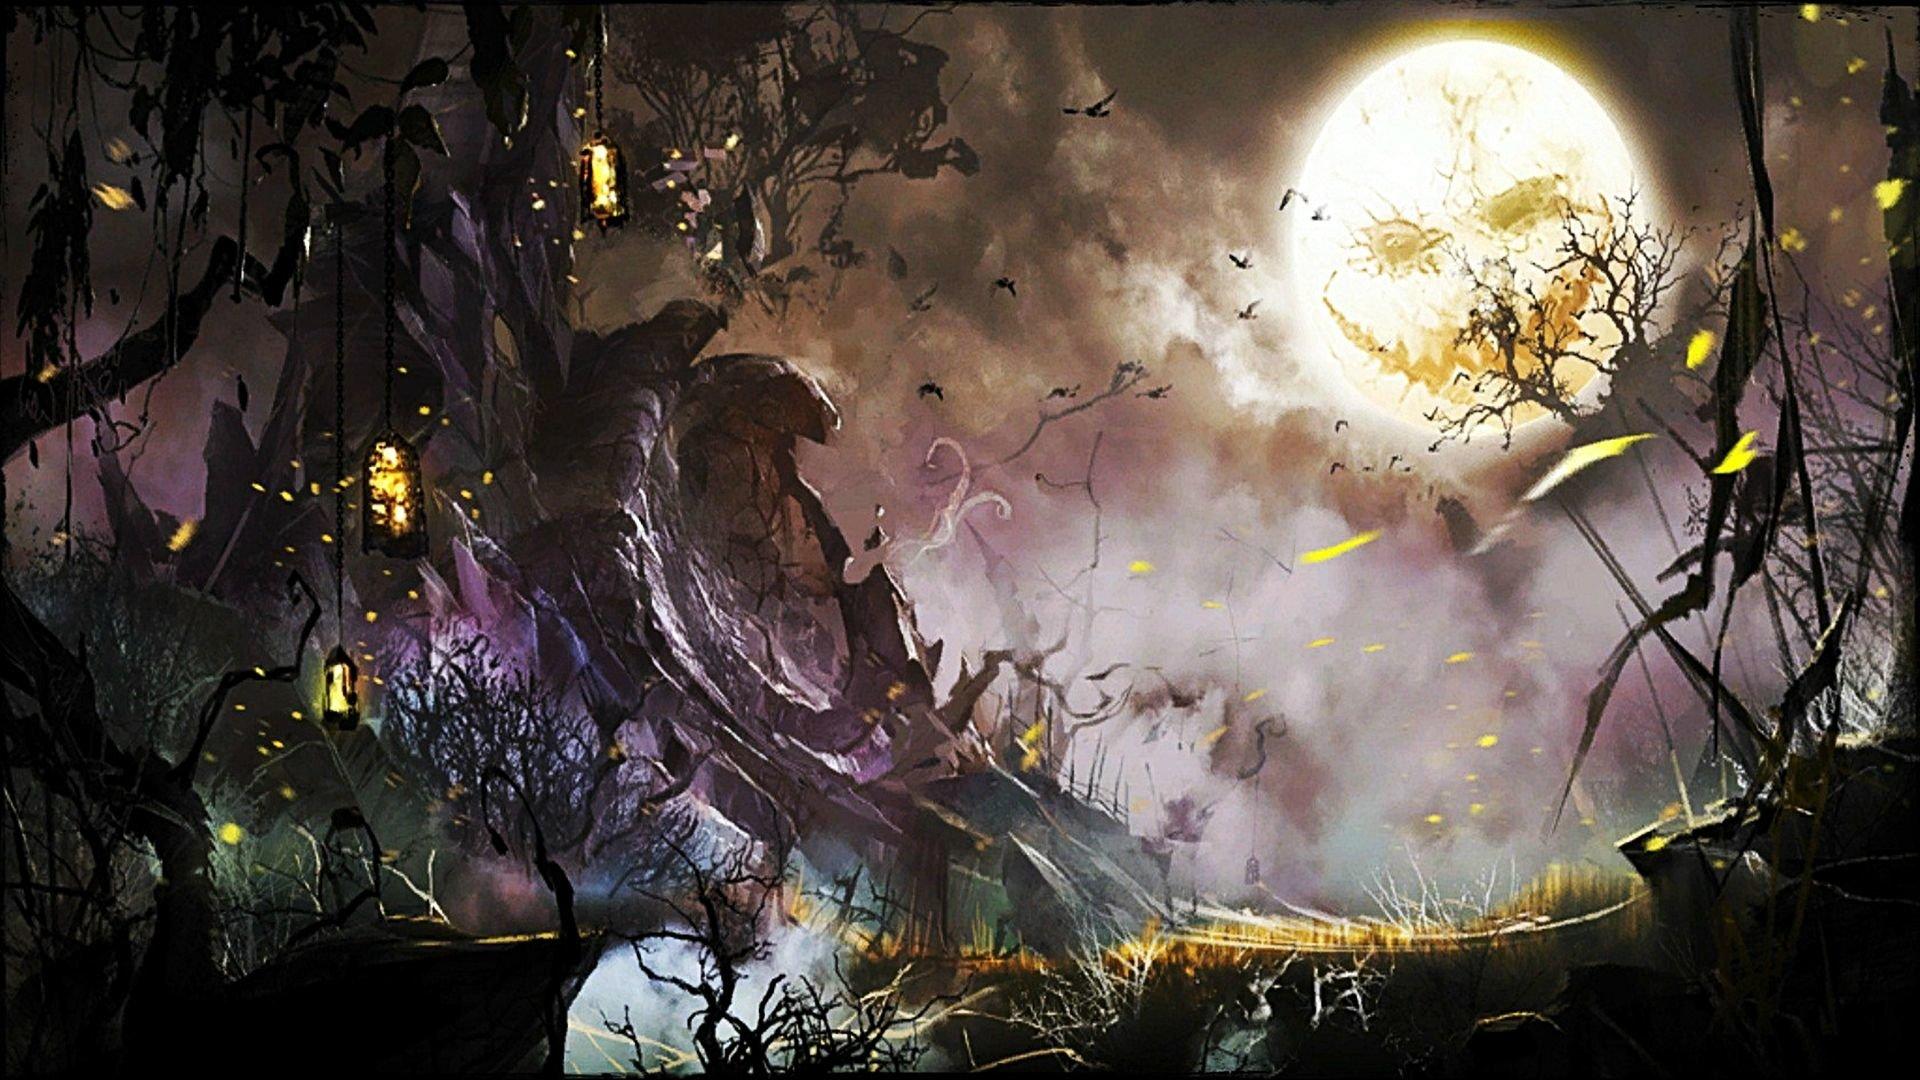 Guild Wars 2 Video Games Charr Wallpapers Hd Desktop: Mad King's Labyrinth HD Wallpaper